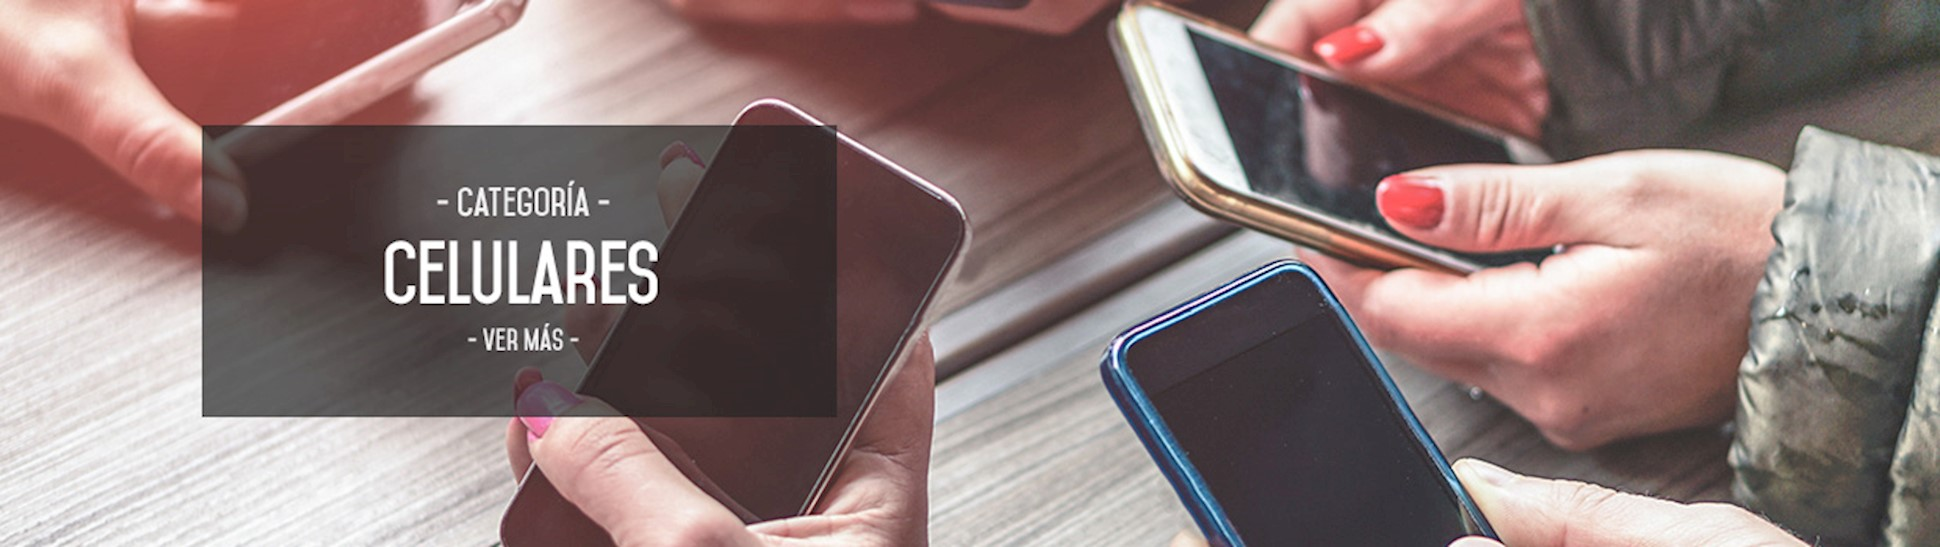 1240x350-celulares.jpg